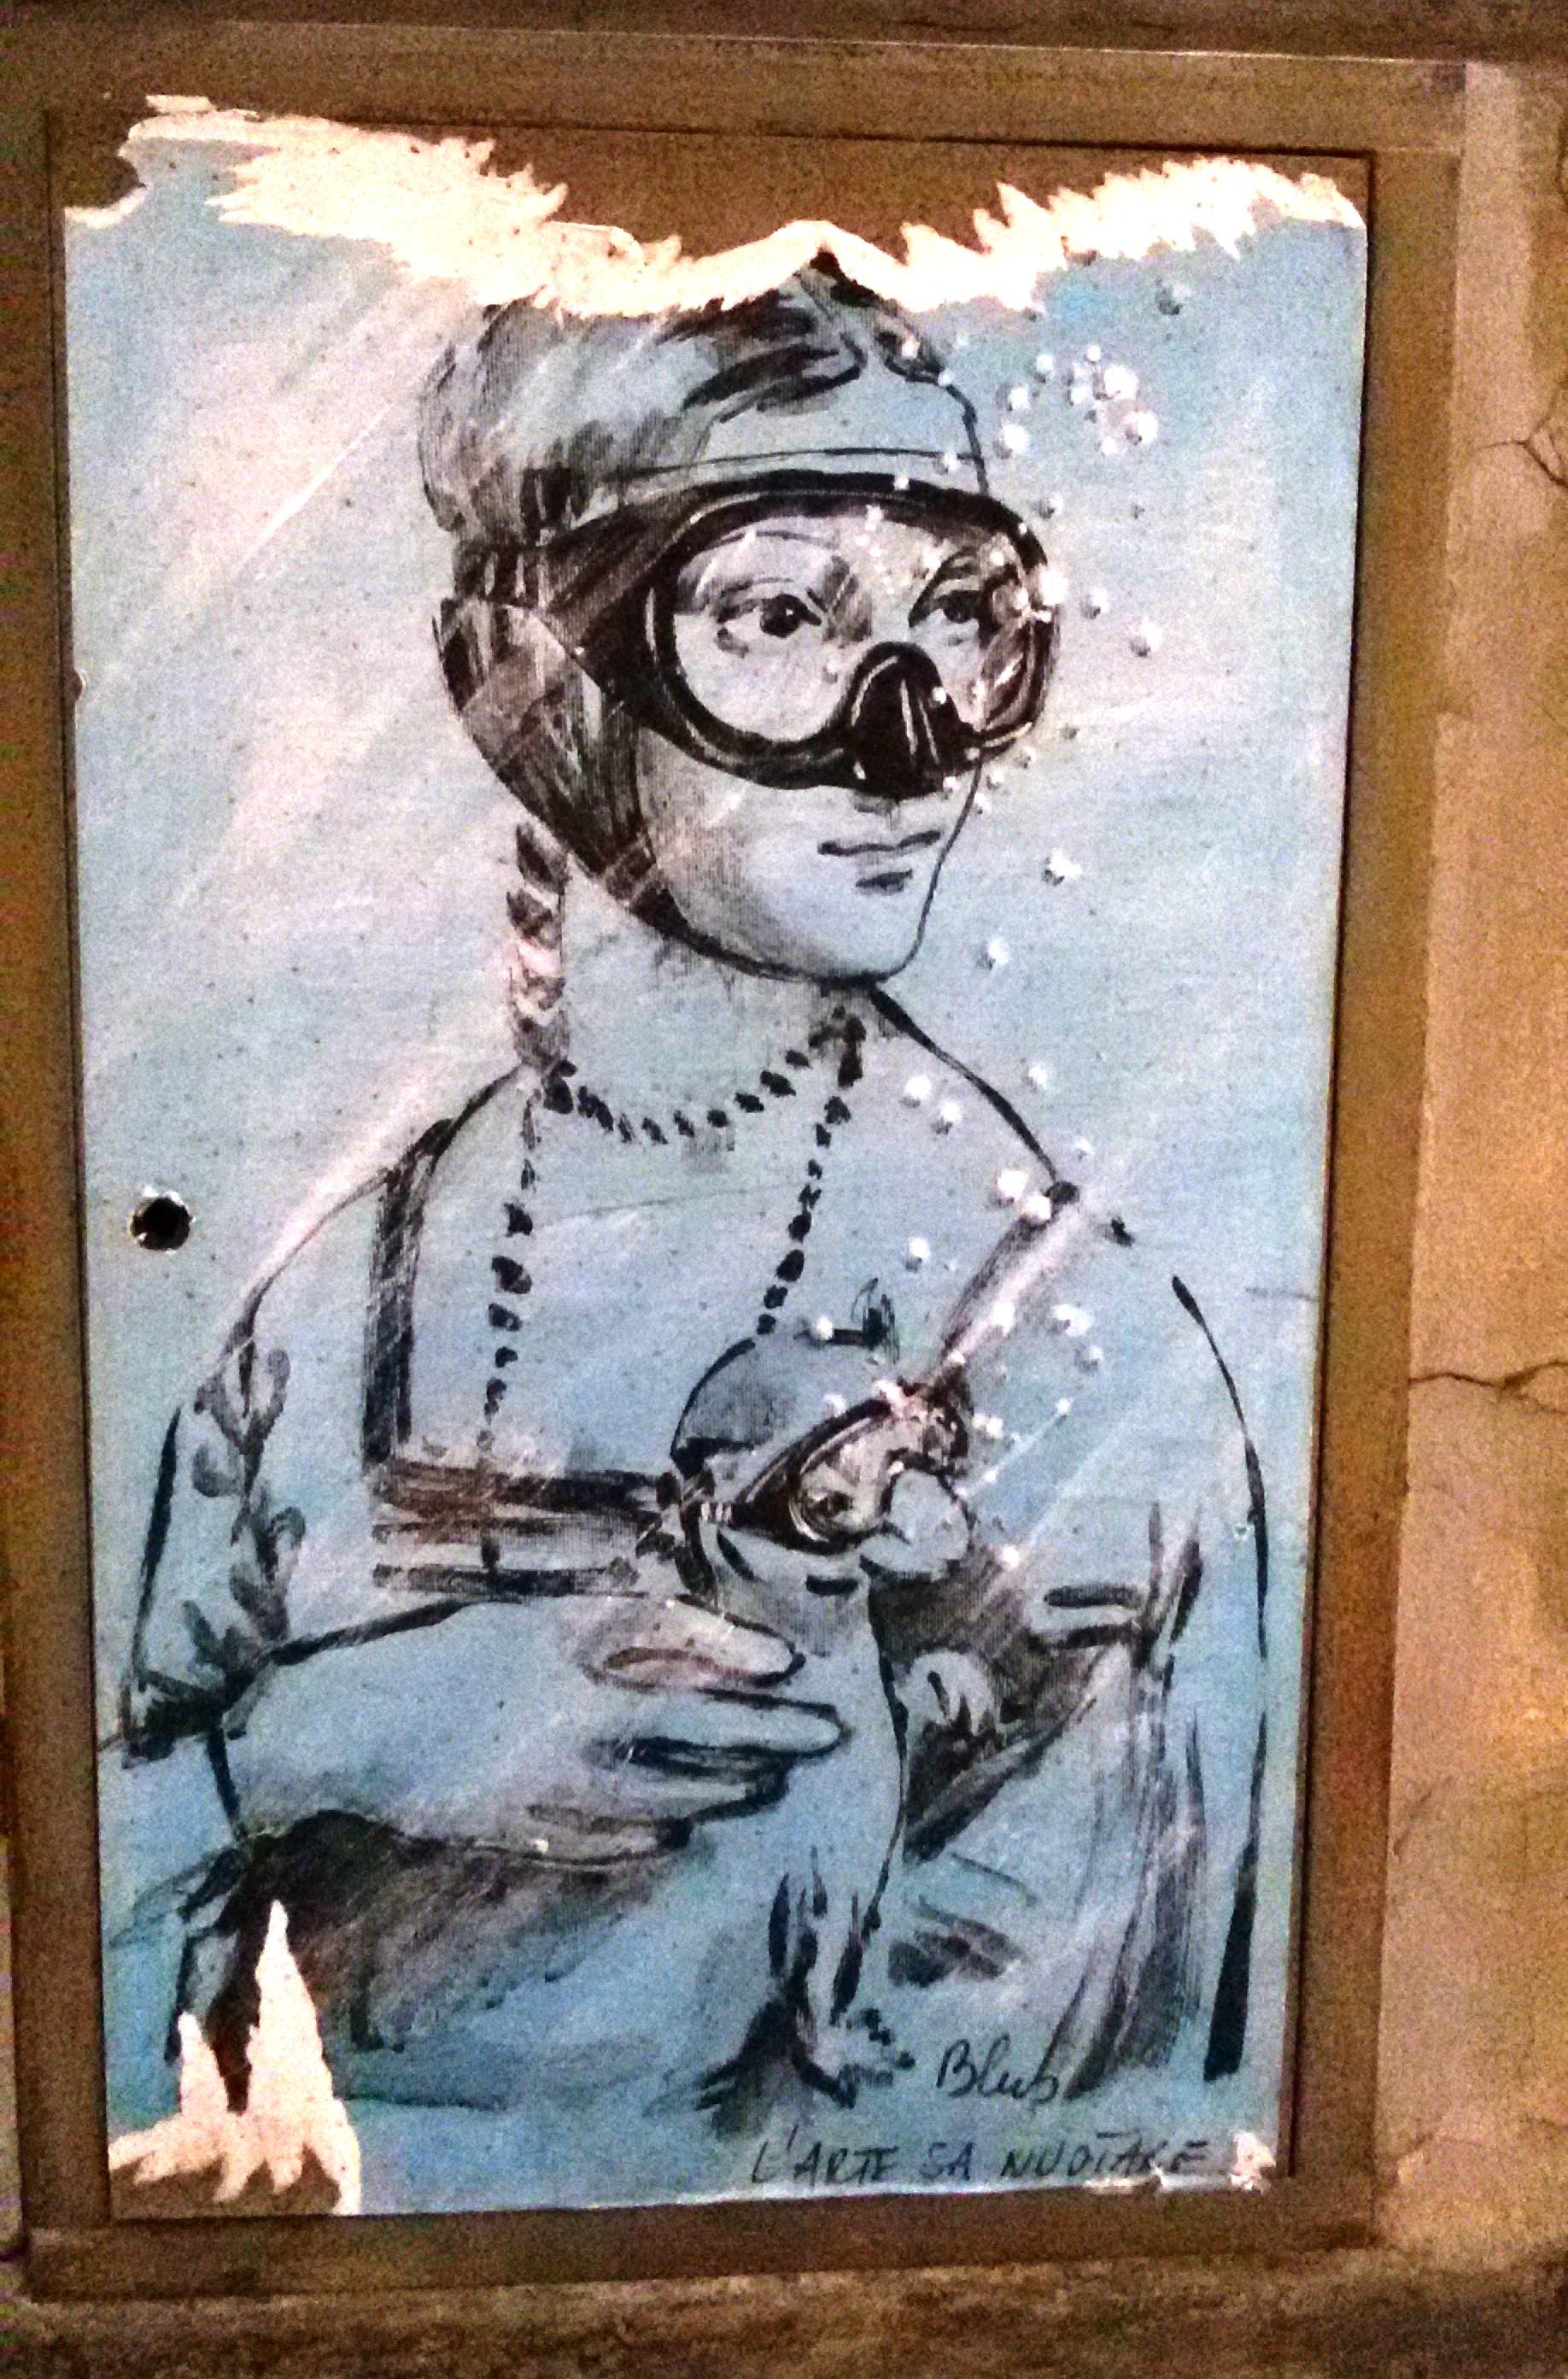 Arte urbano en Florencia. L´arte sa nuotare